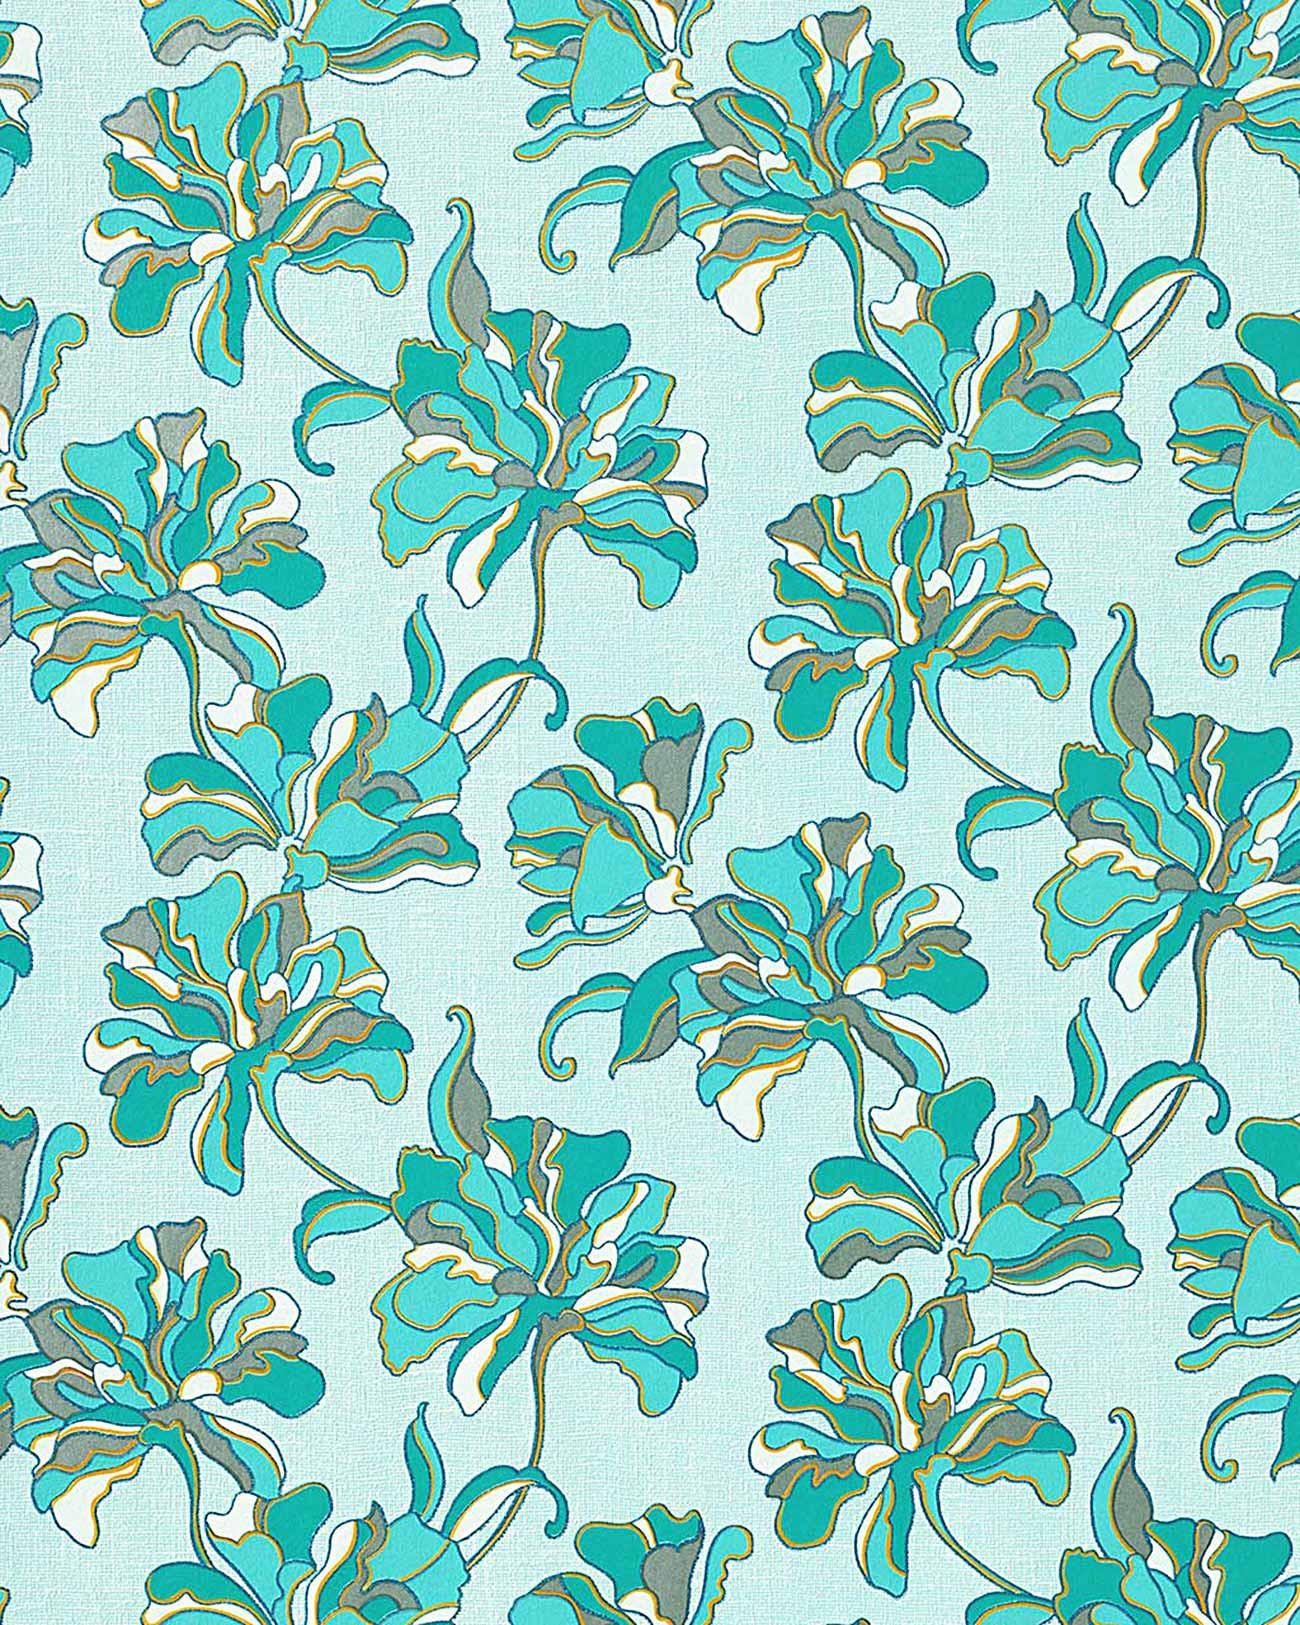 Tapeten Asiatische Muster : Blumentapete EDEM 072-22 Tapete Floral Designer Blumen Vinyltapete